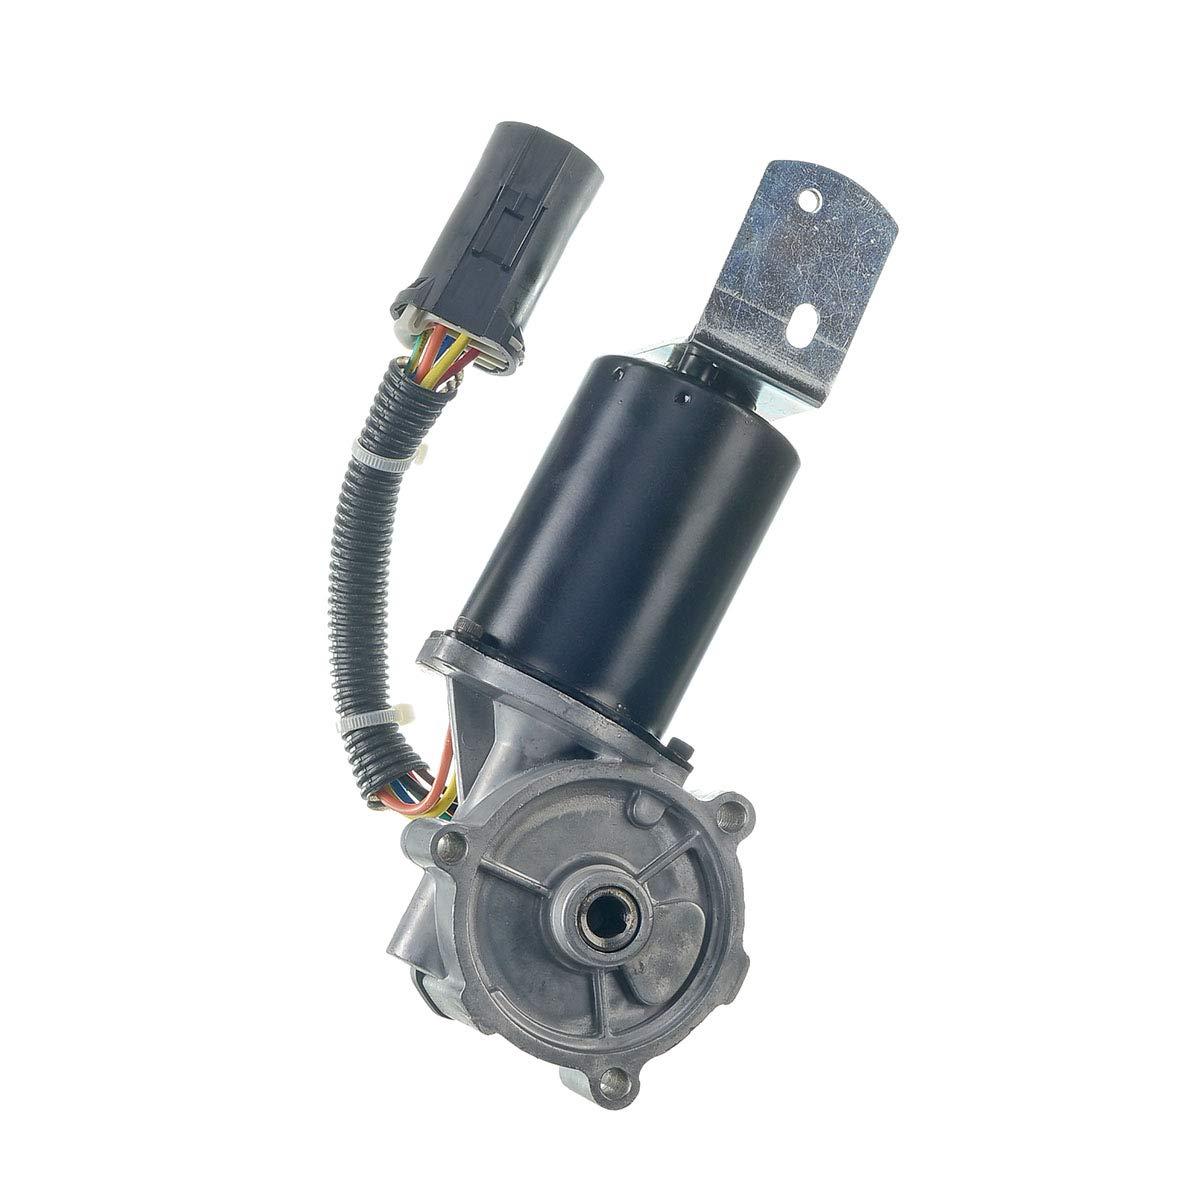 A-Premium Transfer Case Shift Motor for Mercedes-Benz W163 ML320 ML350 ML430 ML500 ML55 AMG 4WD Only